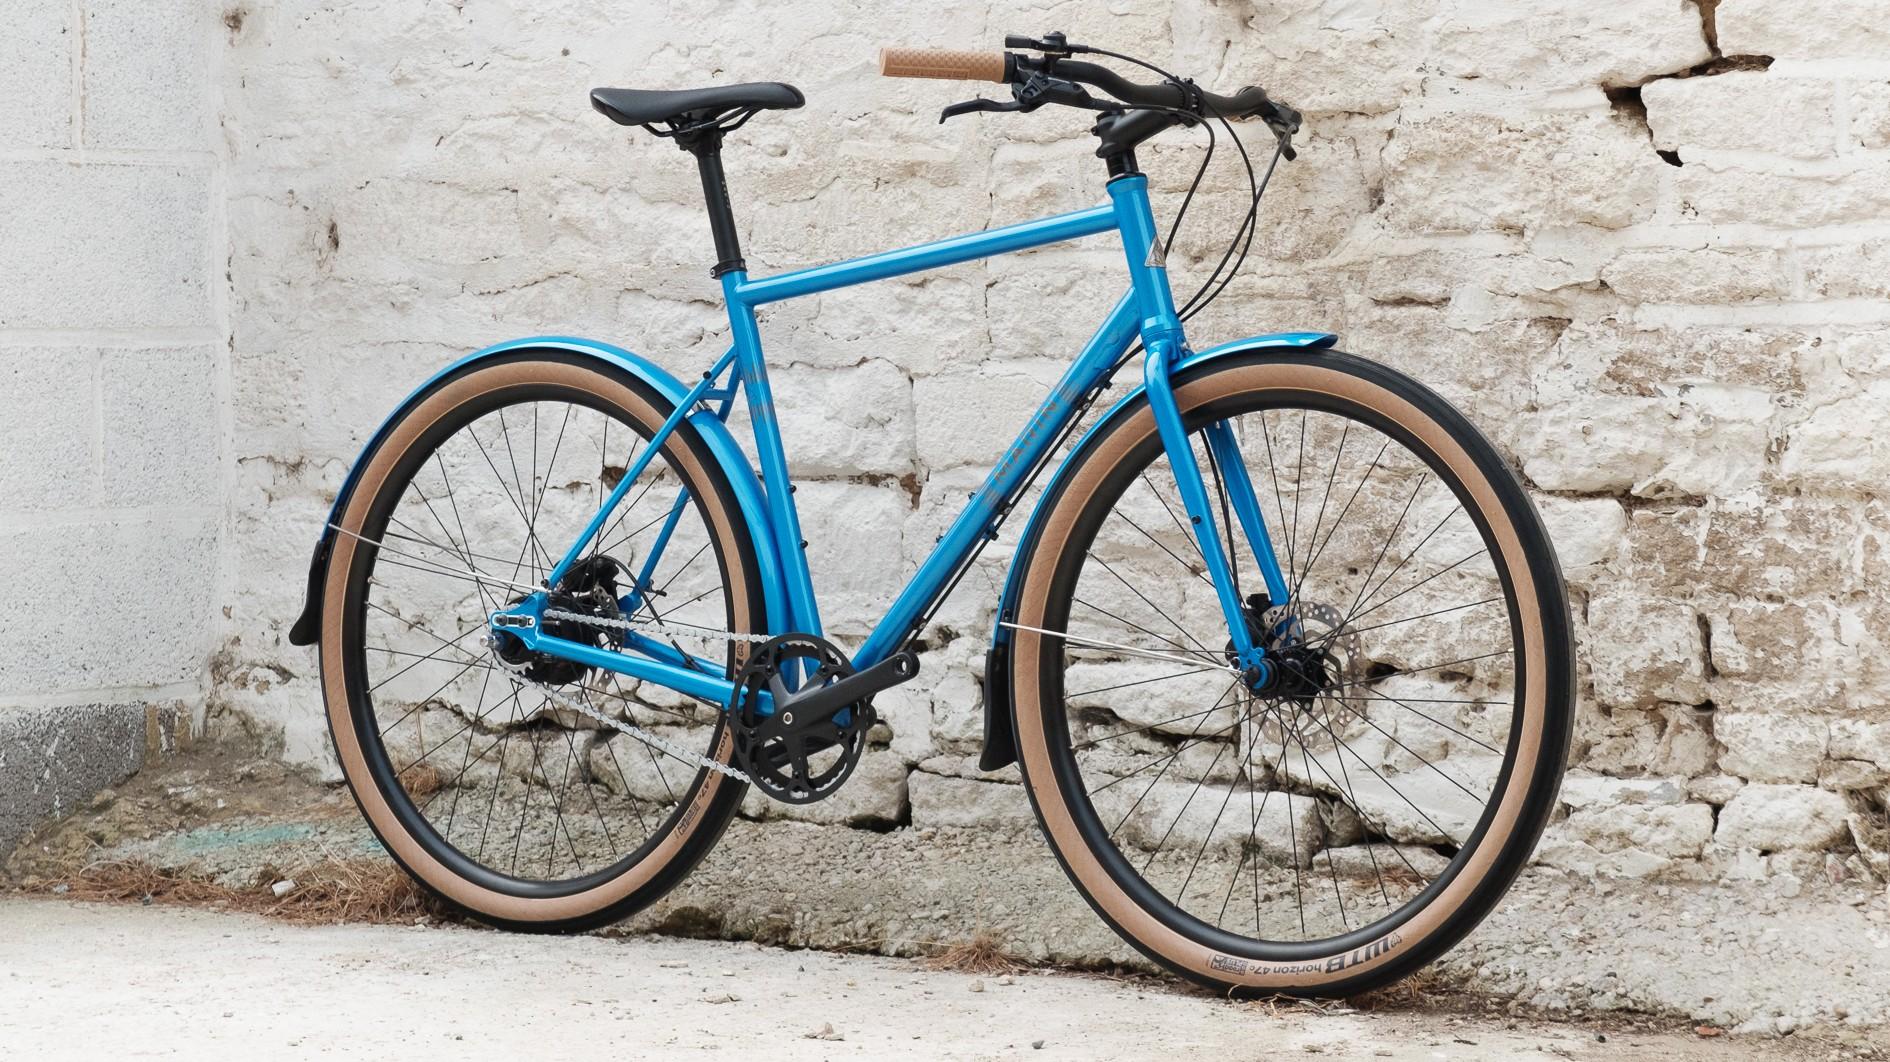 The bike is built around WTB's 47mm wide Horizon tyres